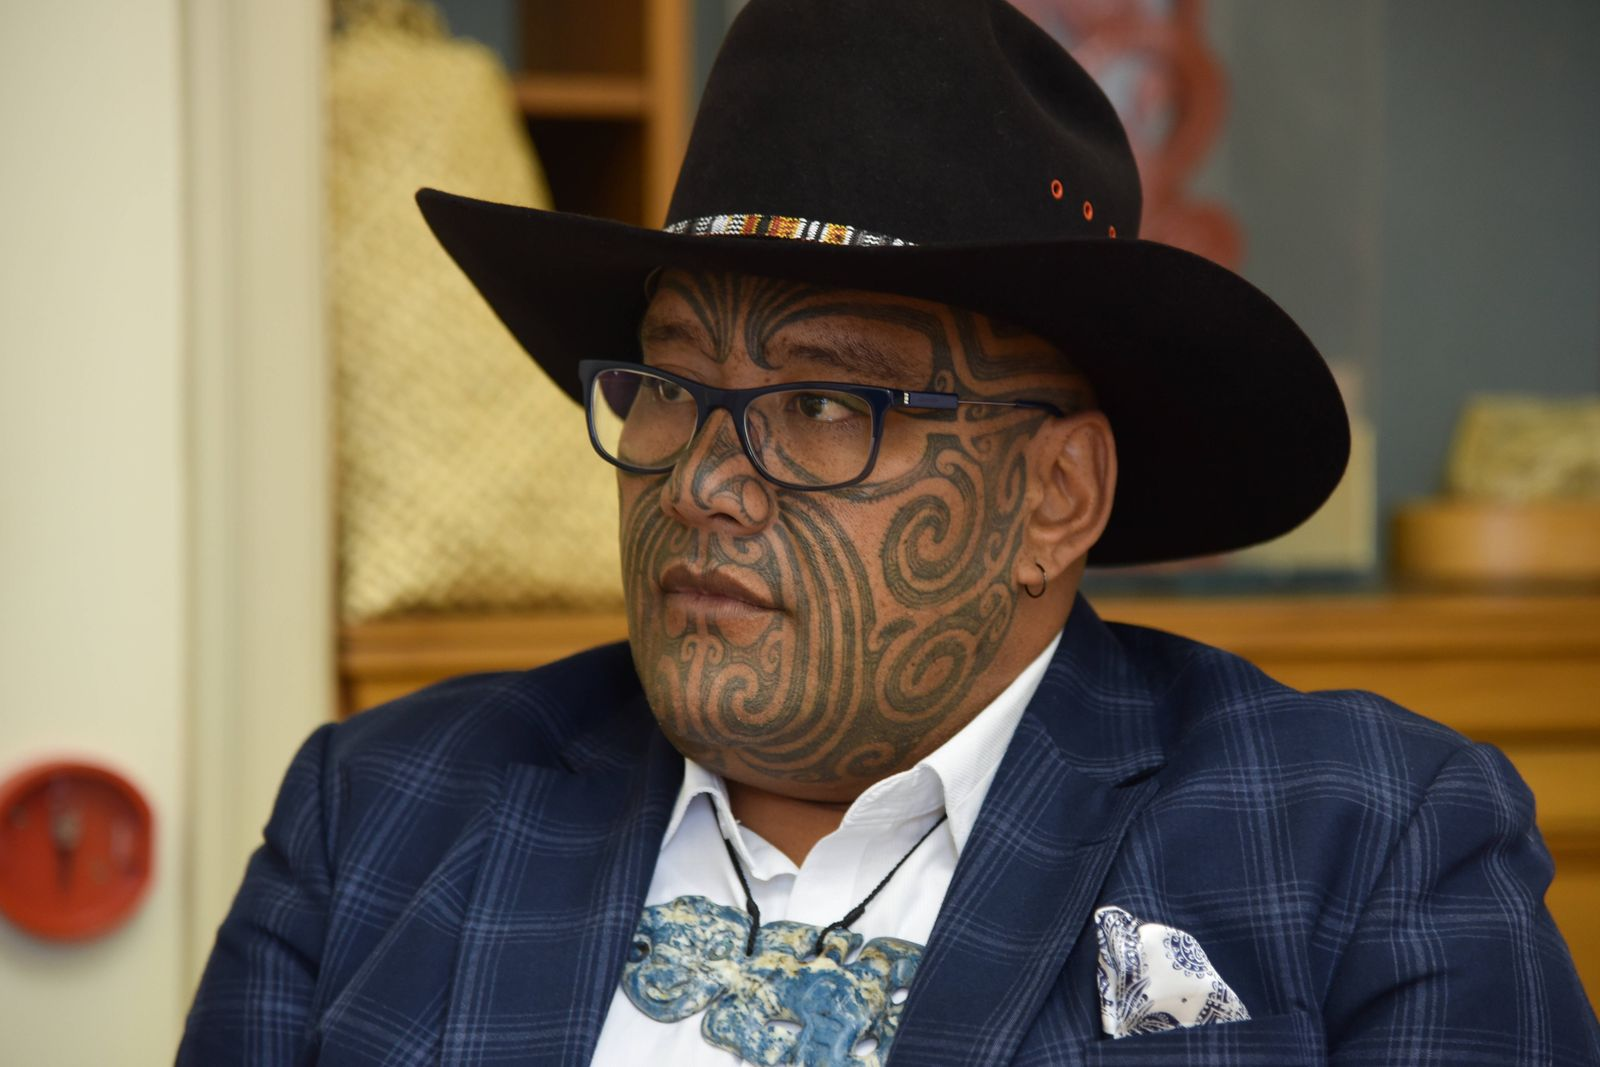 NEW ZEALAND POLITICS, Maori Party co-leader Rawiri Waititi is seen at his parliamentary office in Wellington, New Zeala